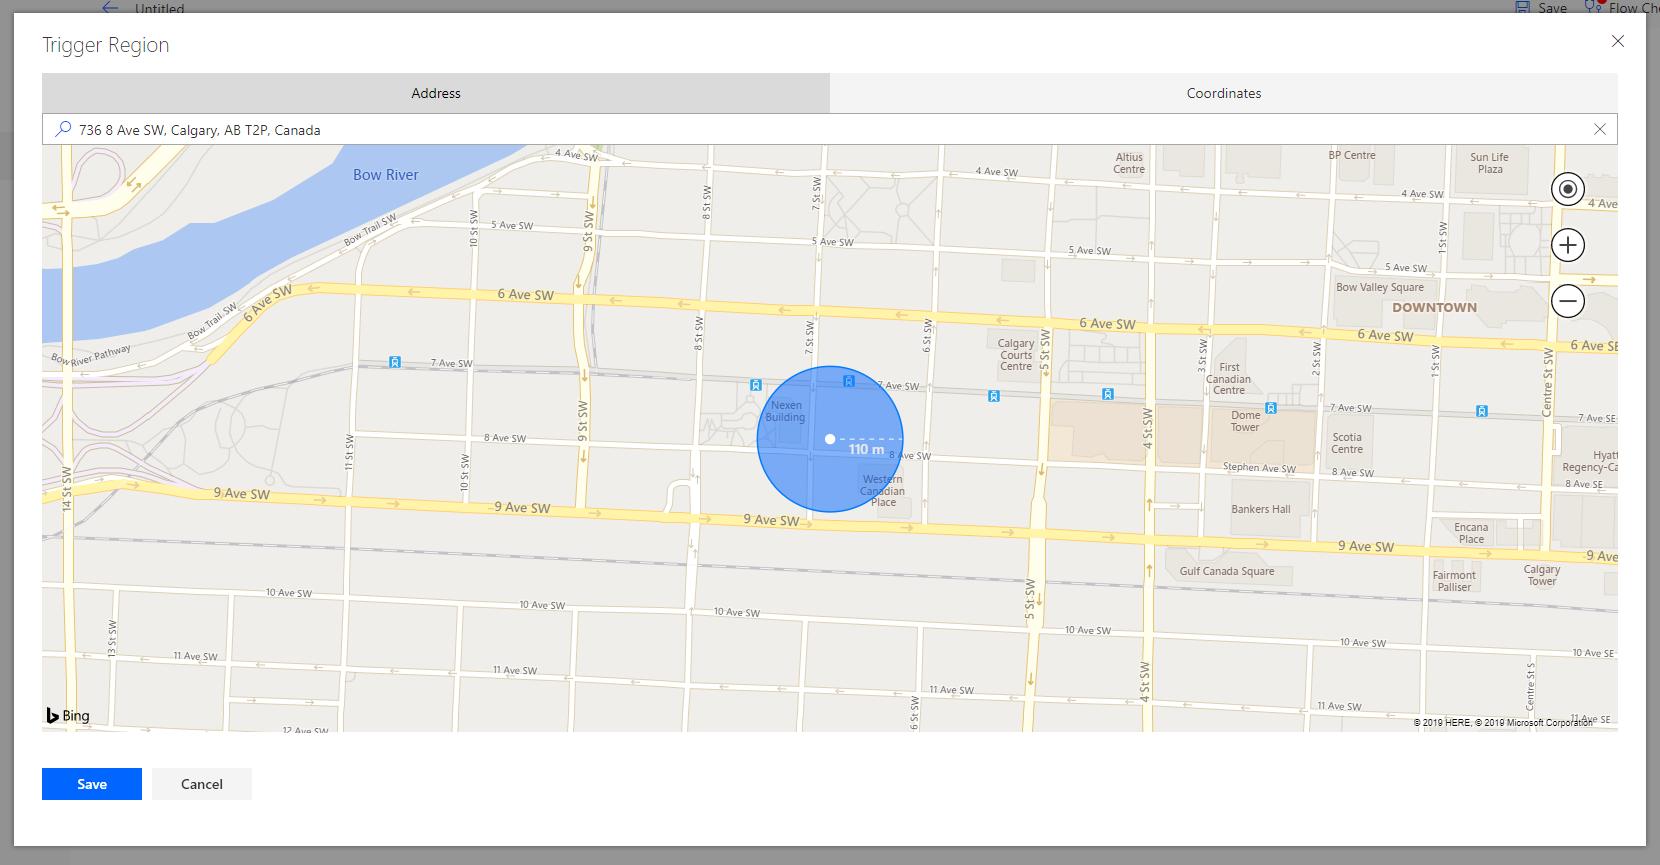 Location Trigger by Address